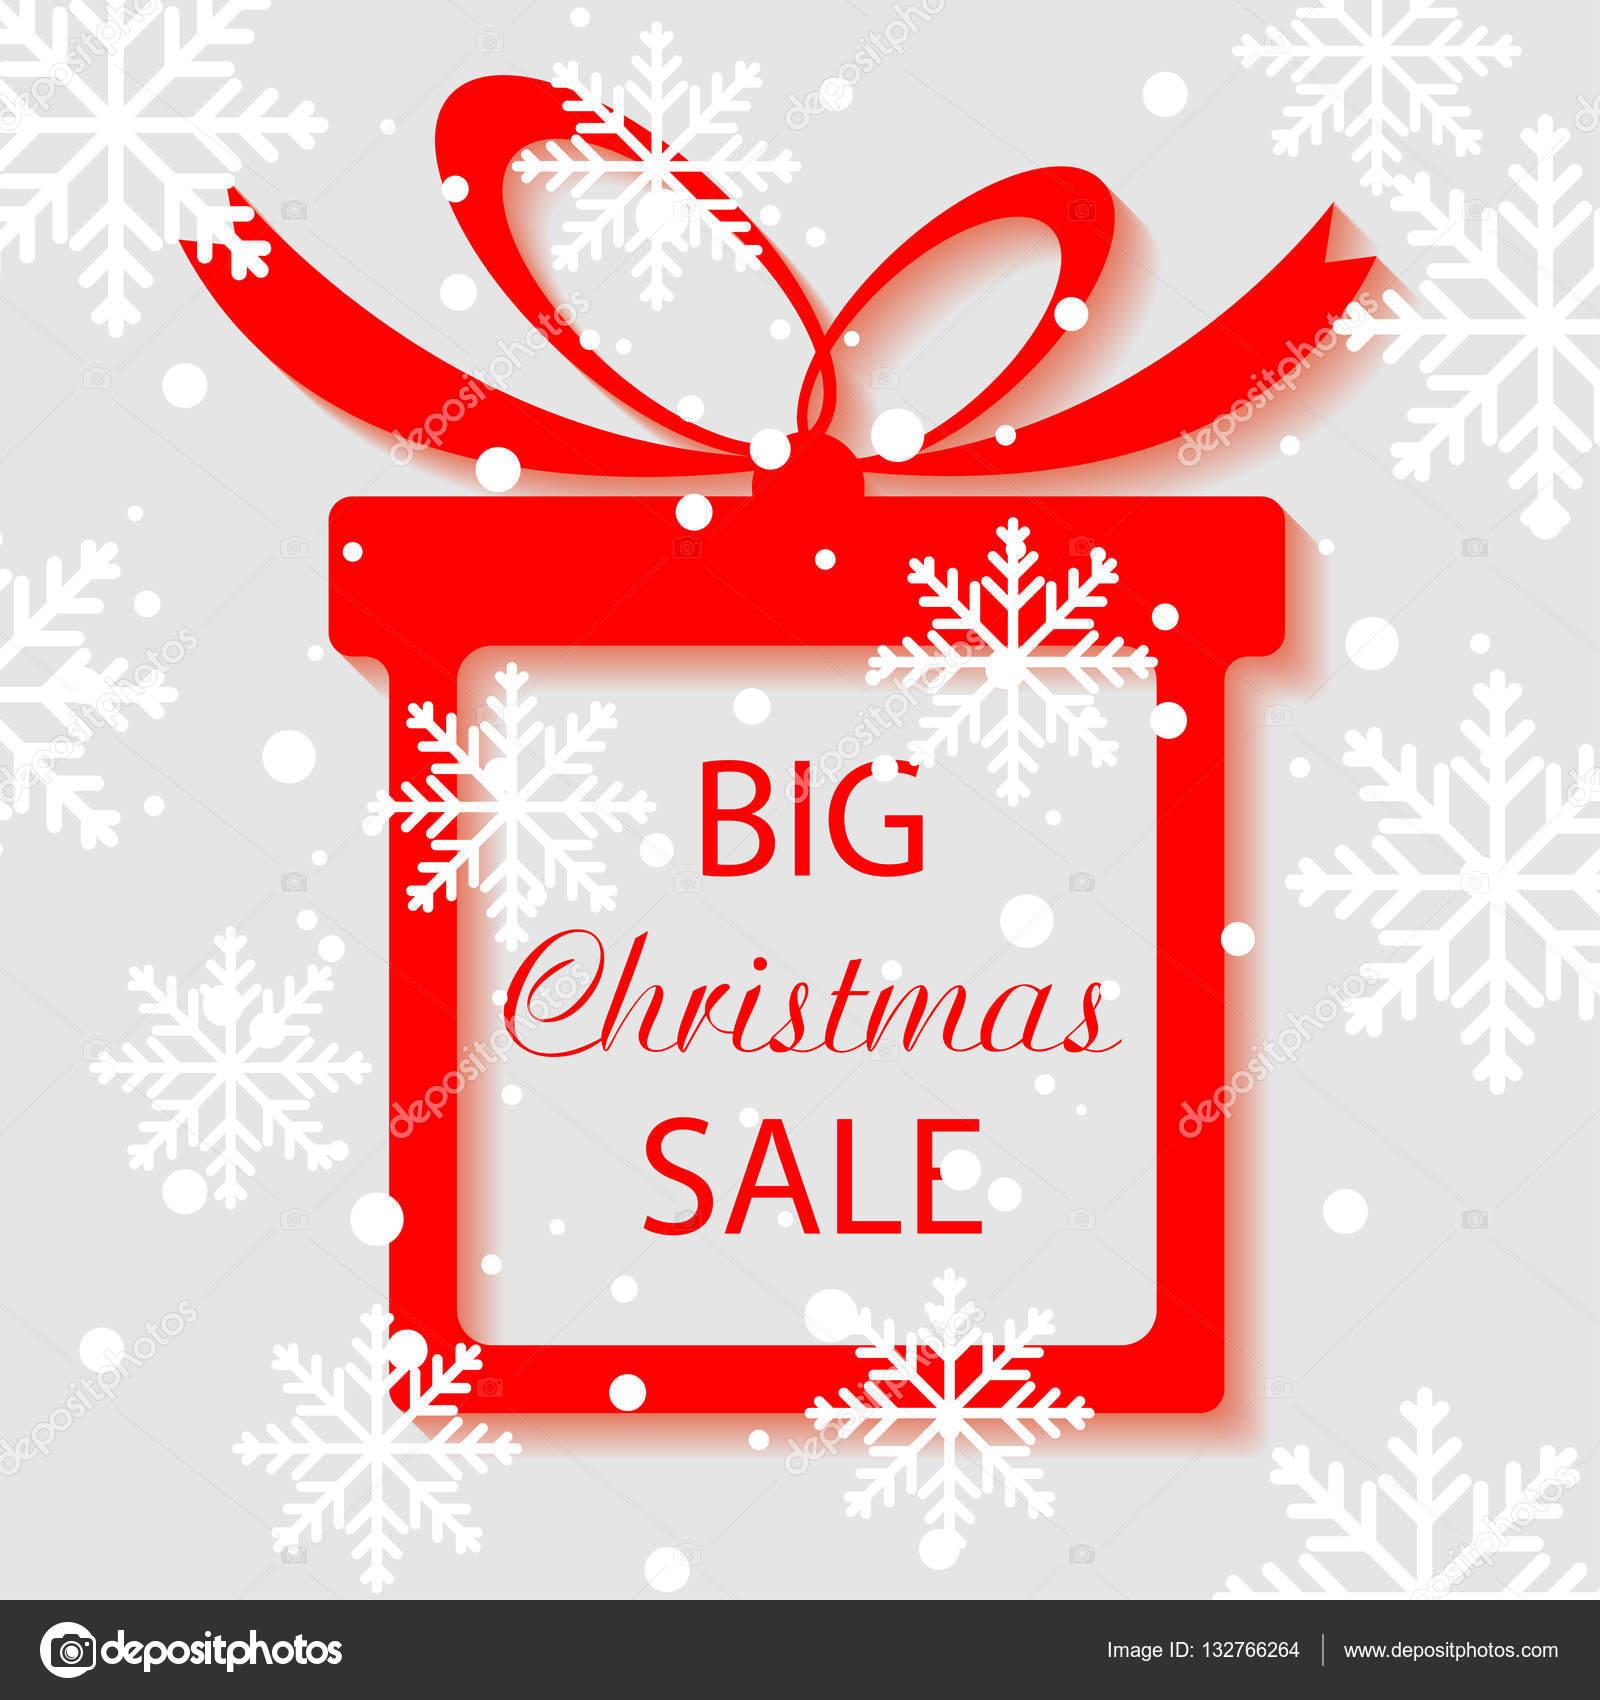 Big Christmas Sale Template Stock Vector C Annakukhmar 132766264